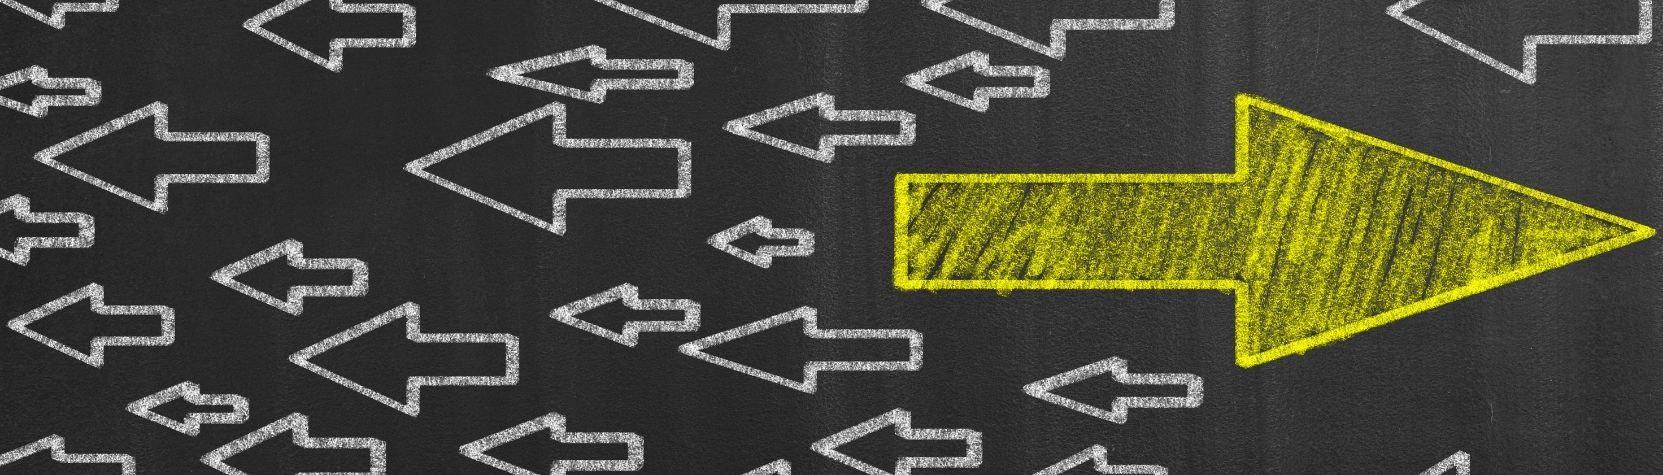 Vds training consultants blog ons werk verandert